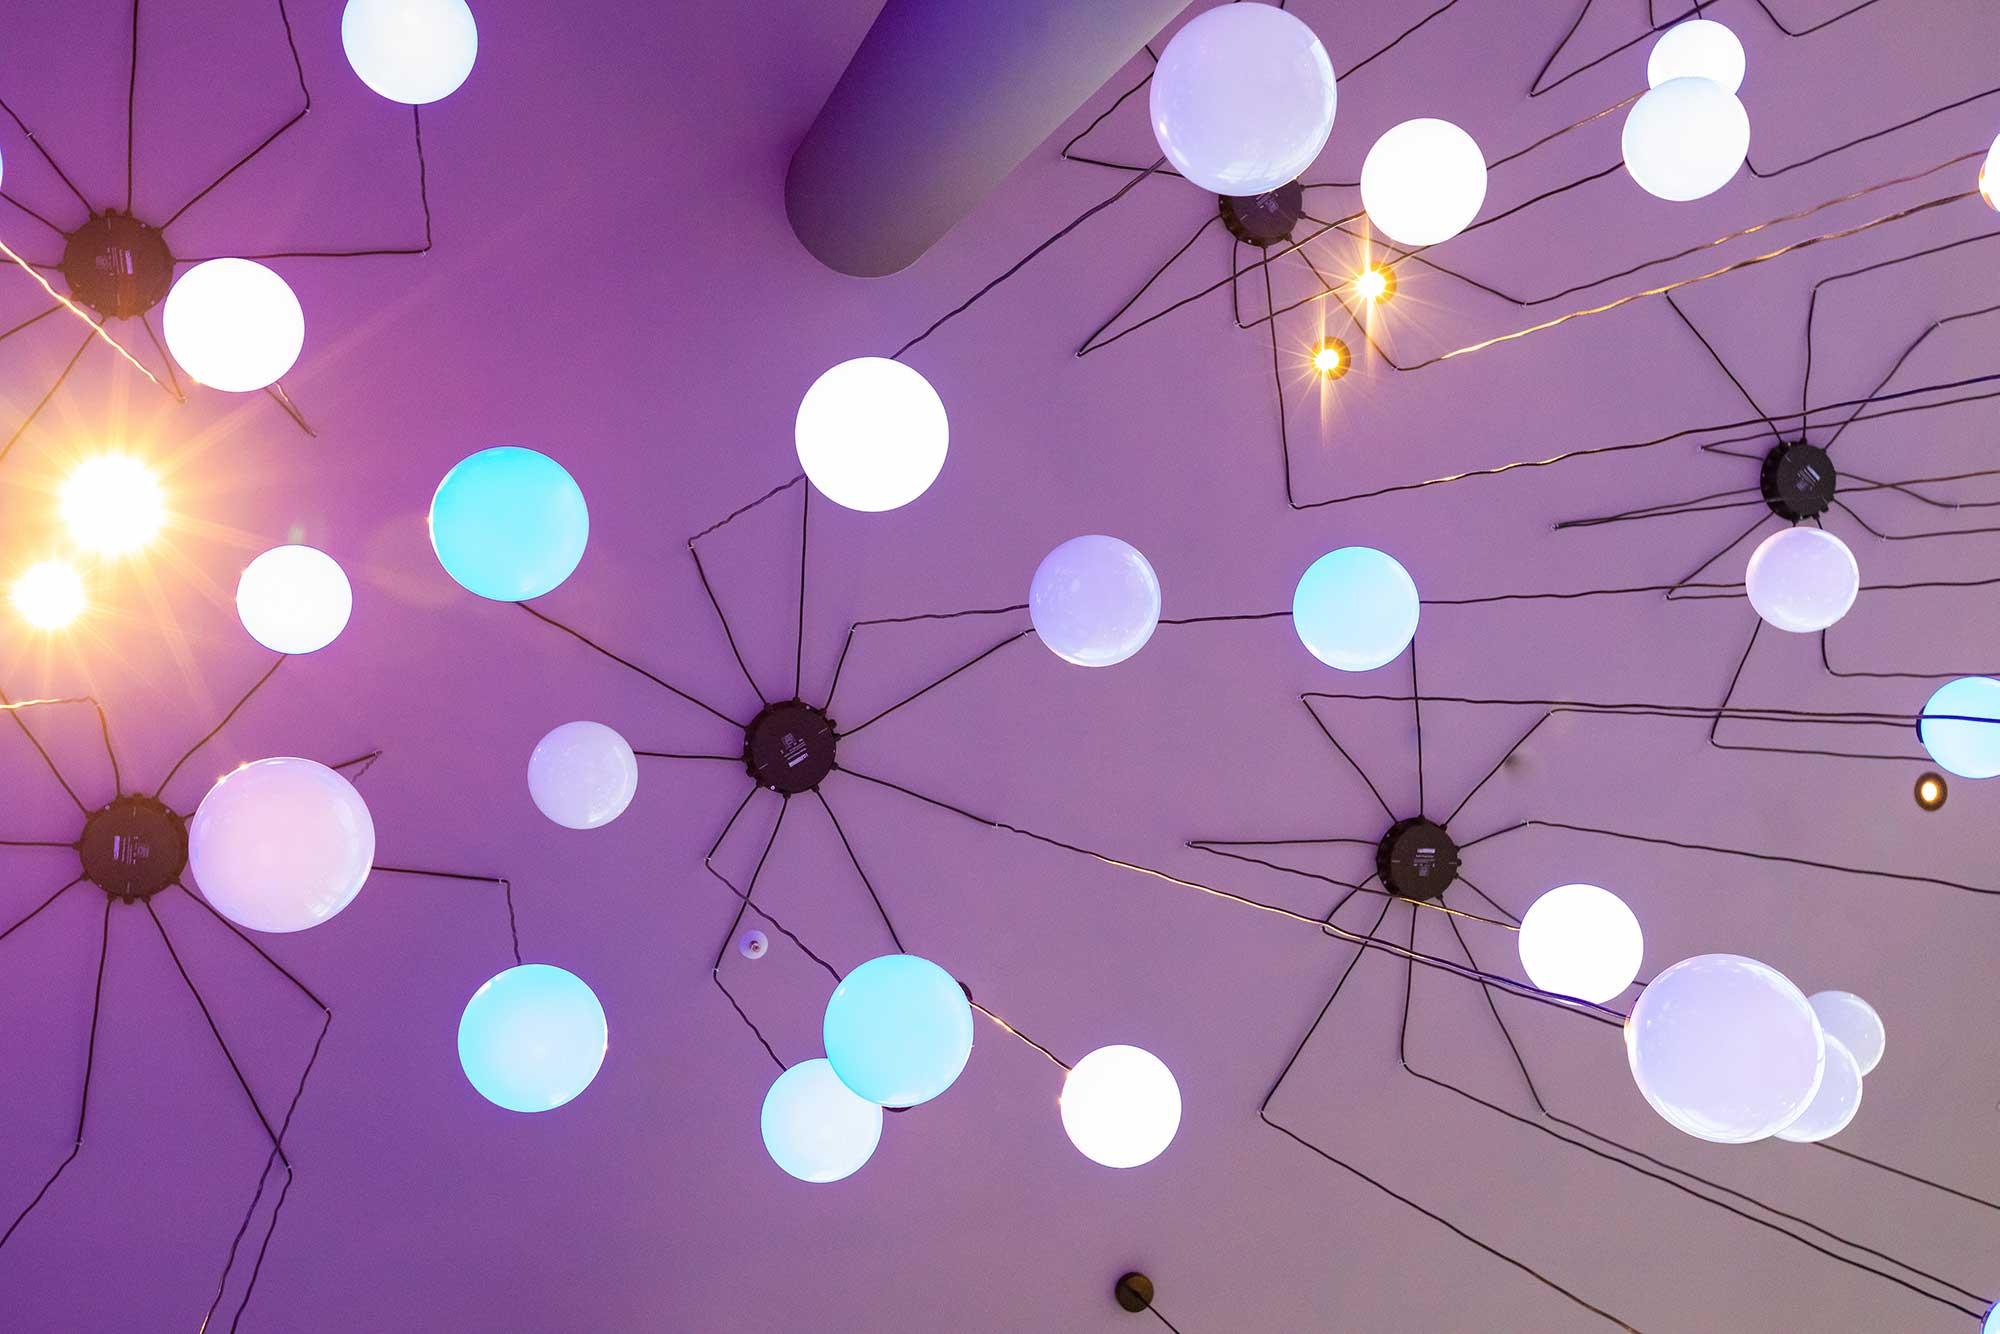 illumination-physics-spheres-roof